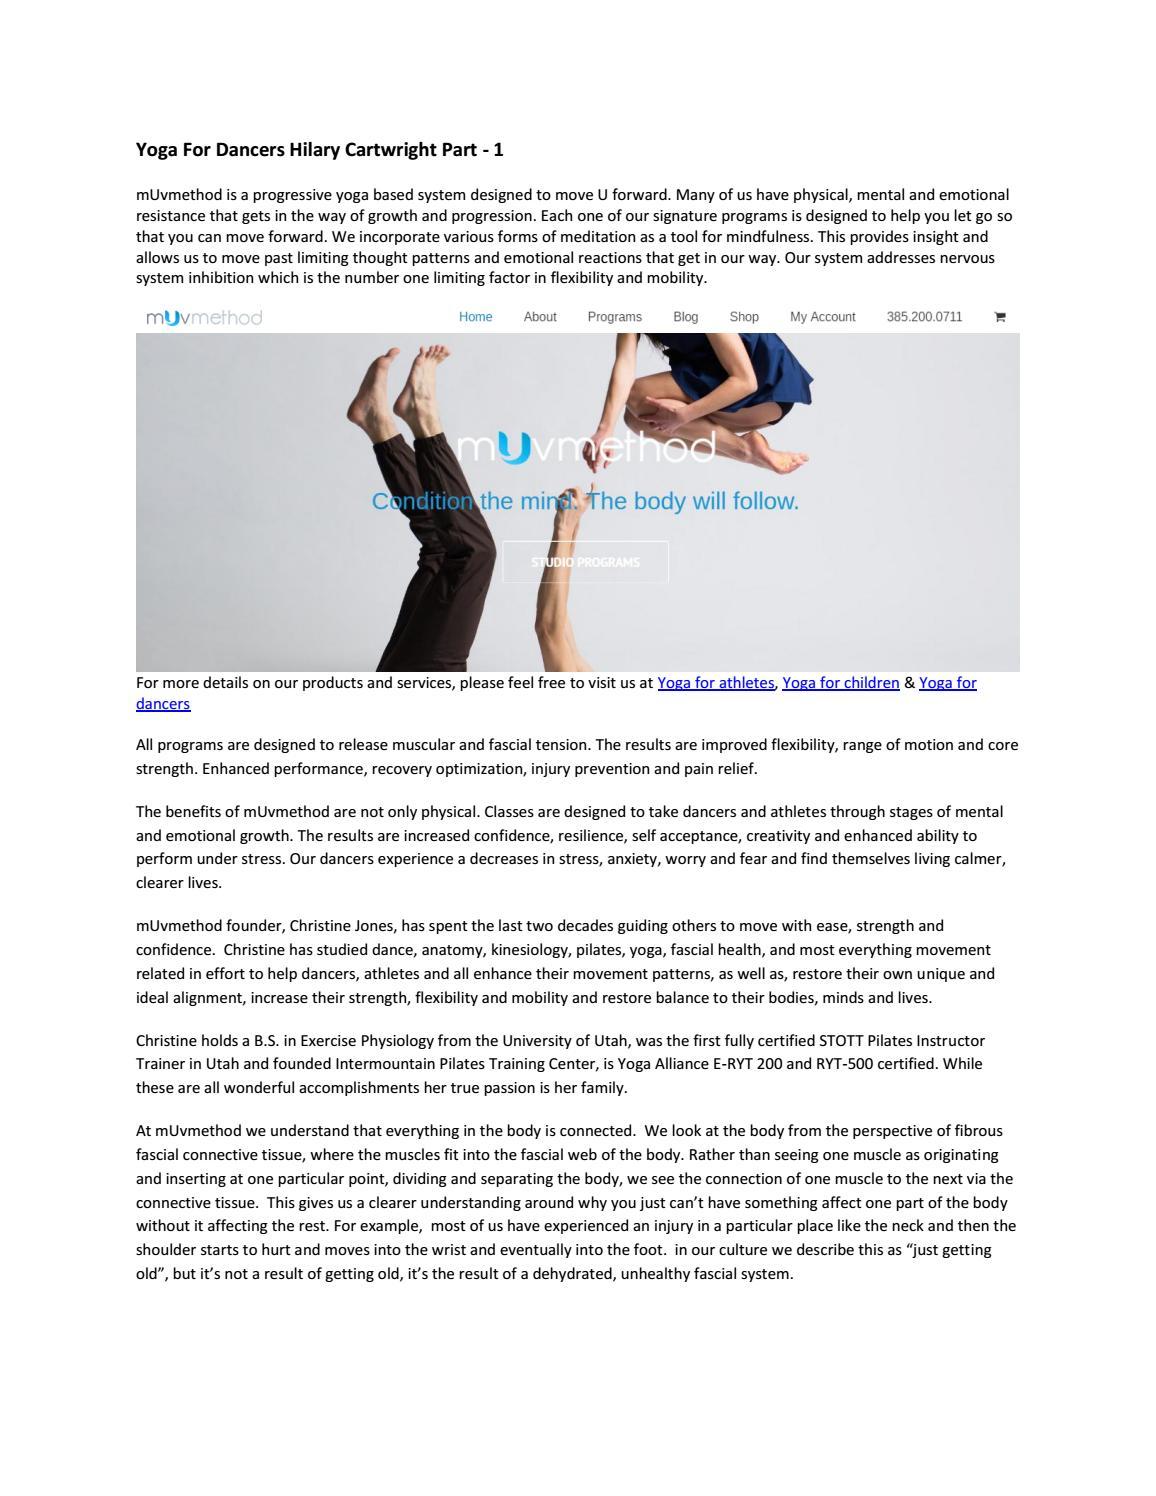 Yoga for dancers hilary cartwright part 1 by mUvmethod - issuu